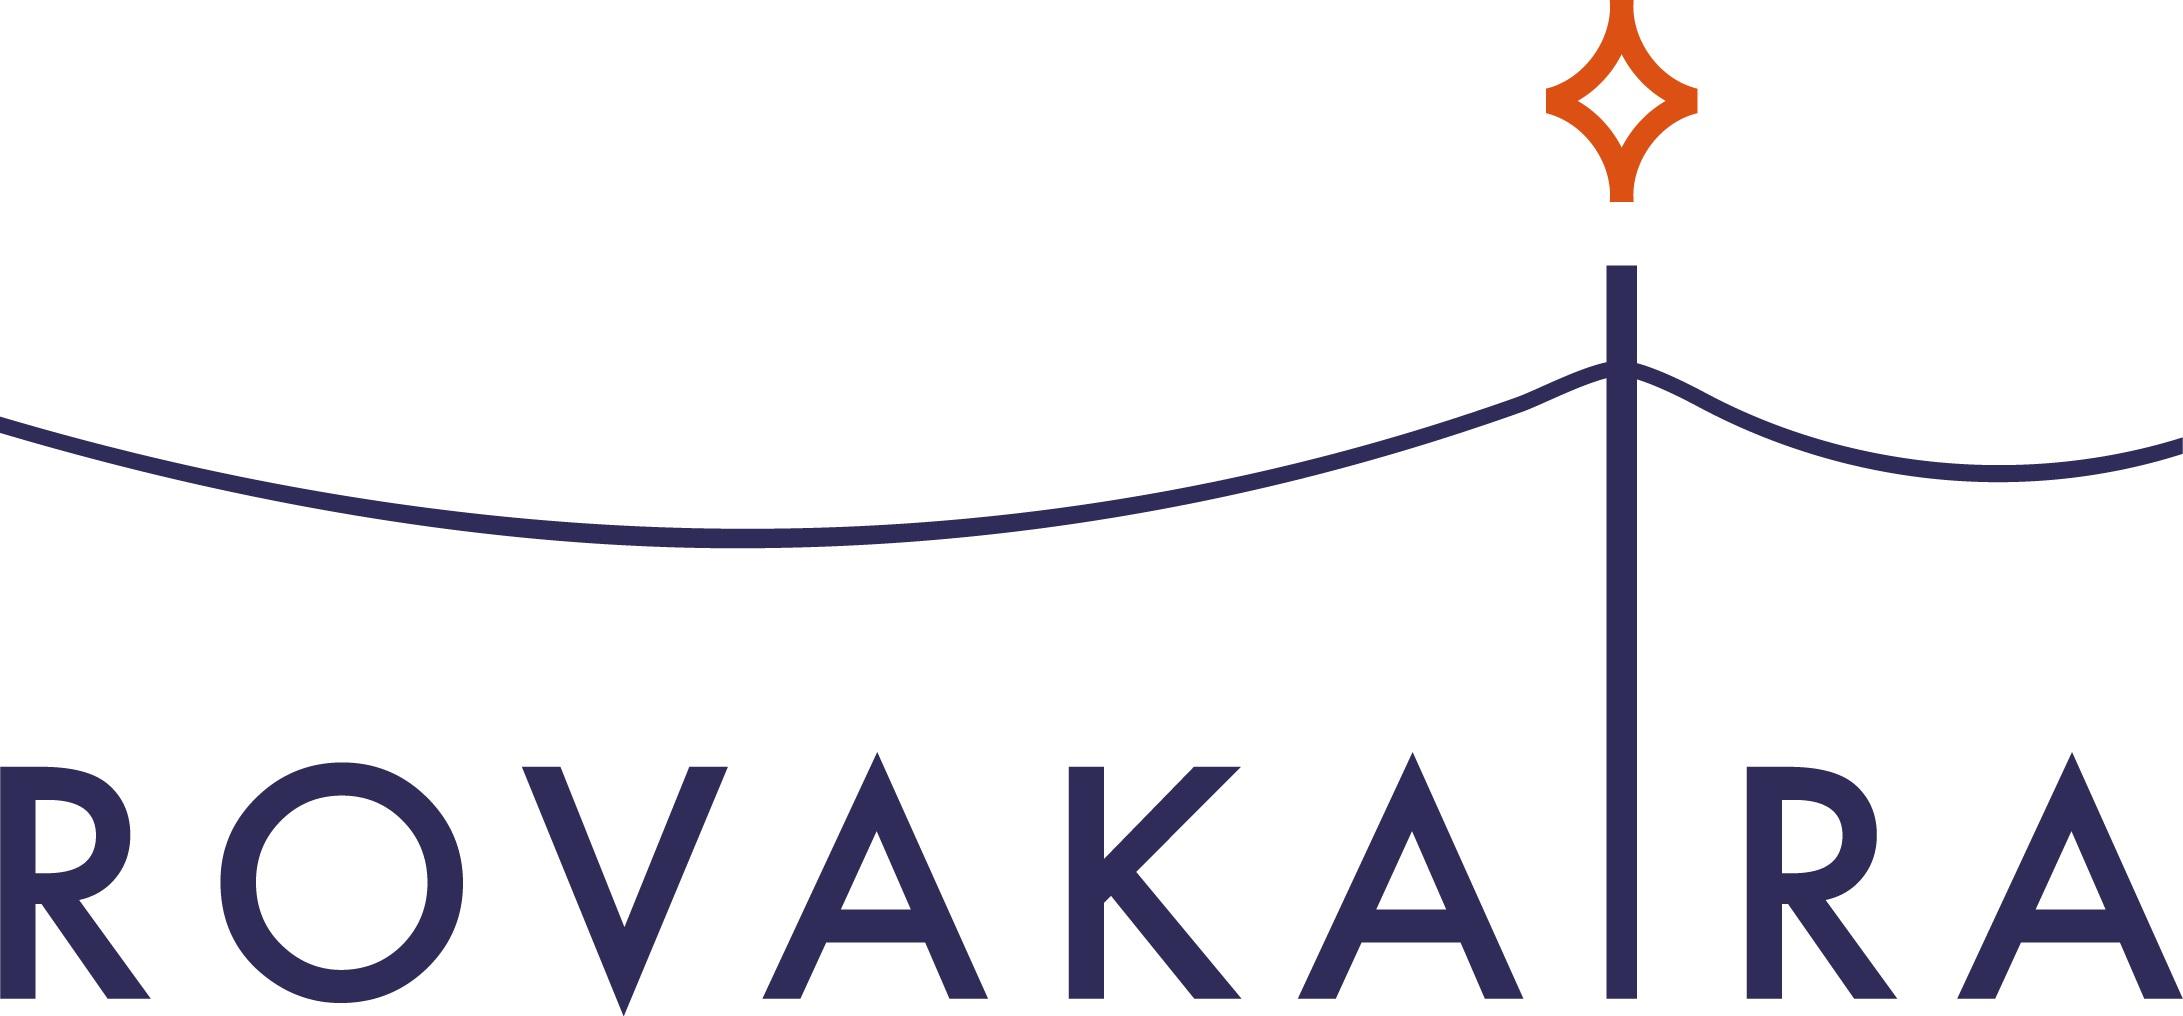 Rovakairan logo 2017_sini_oranssi_perusmuoto _jpg (ID 14380).jpg